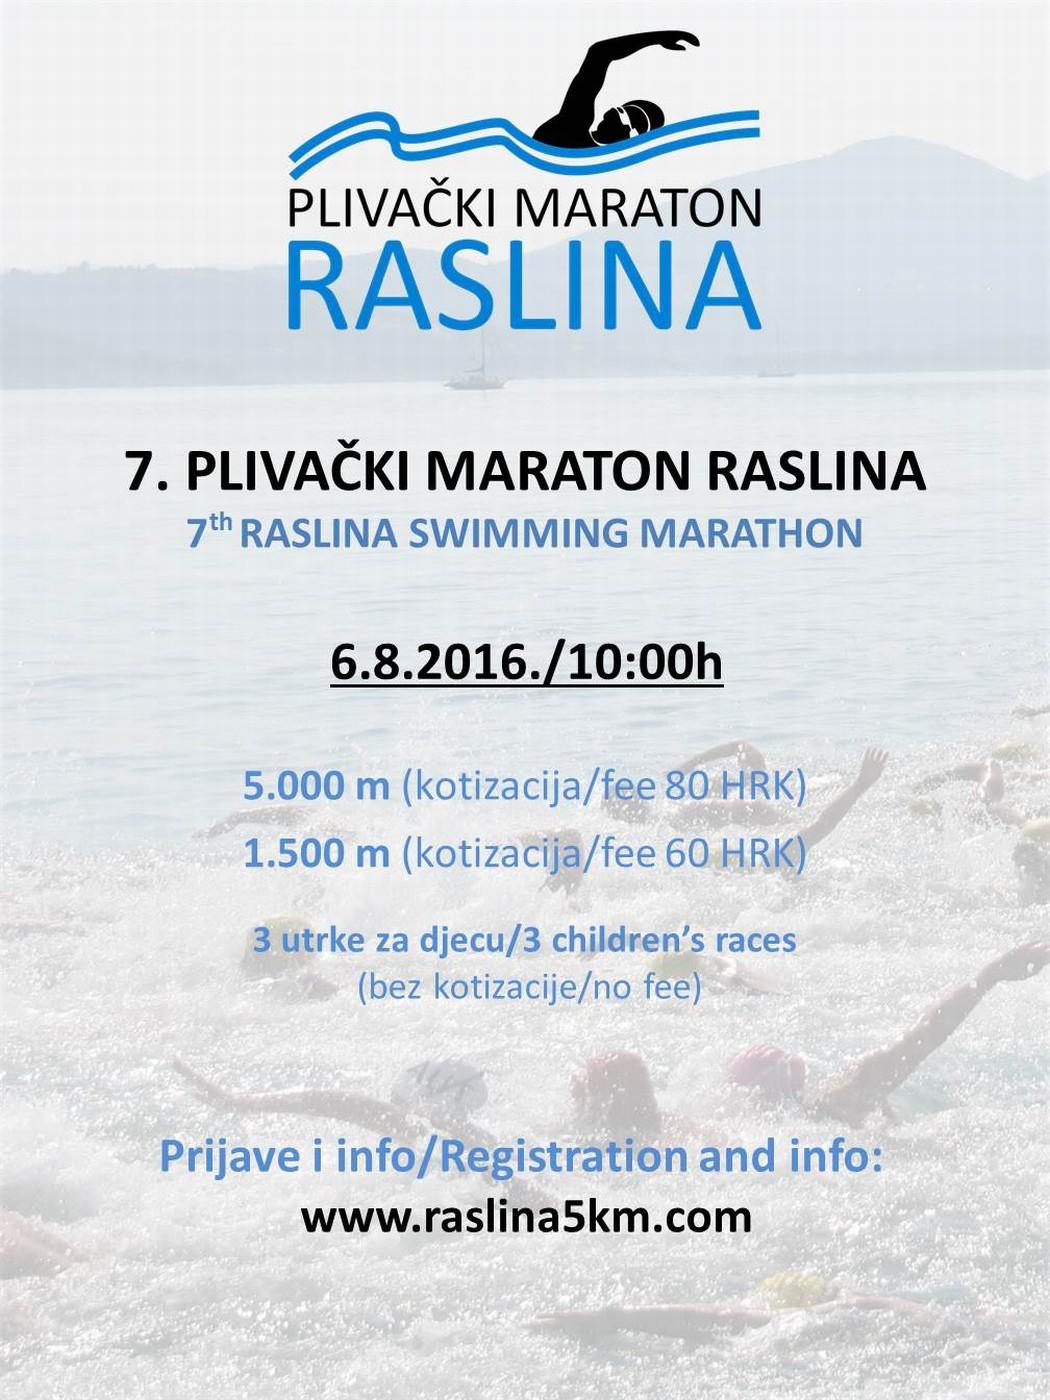 7. PM RASLINA - Plakat